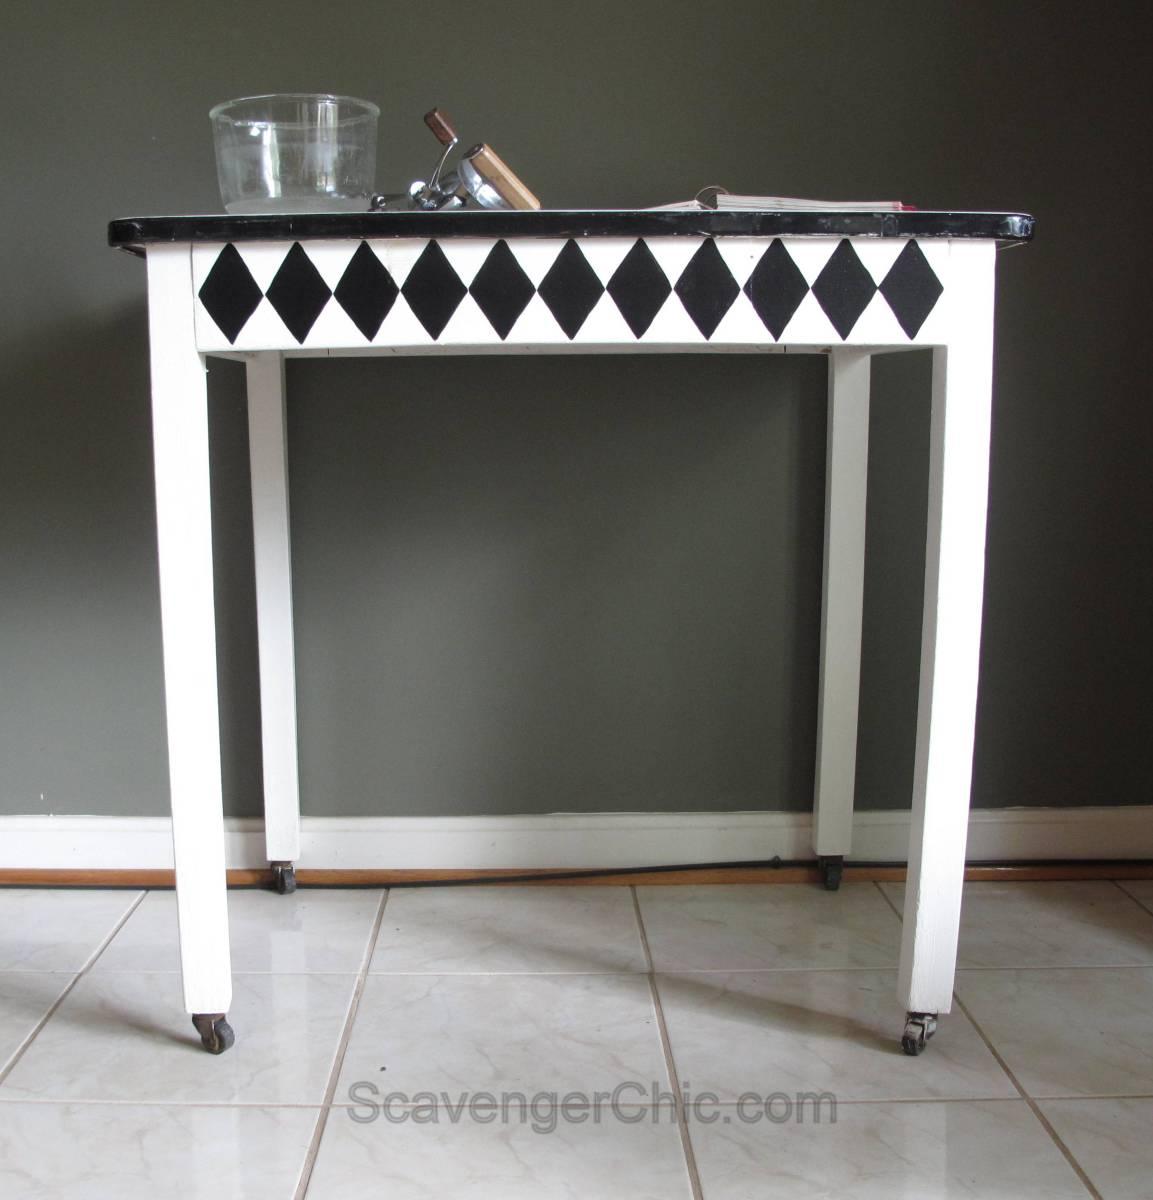 Vintage Black And White Enamel Table Scavenger Chic